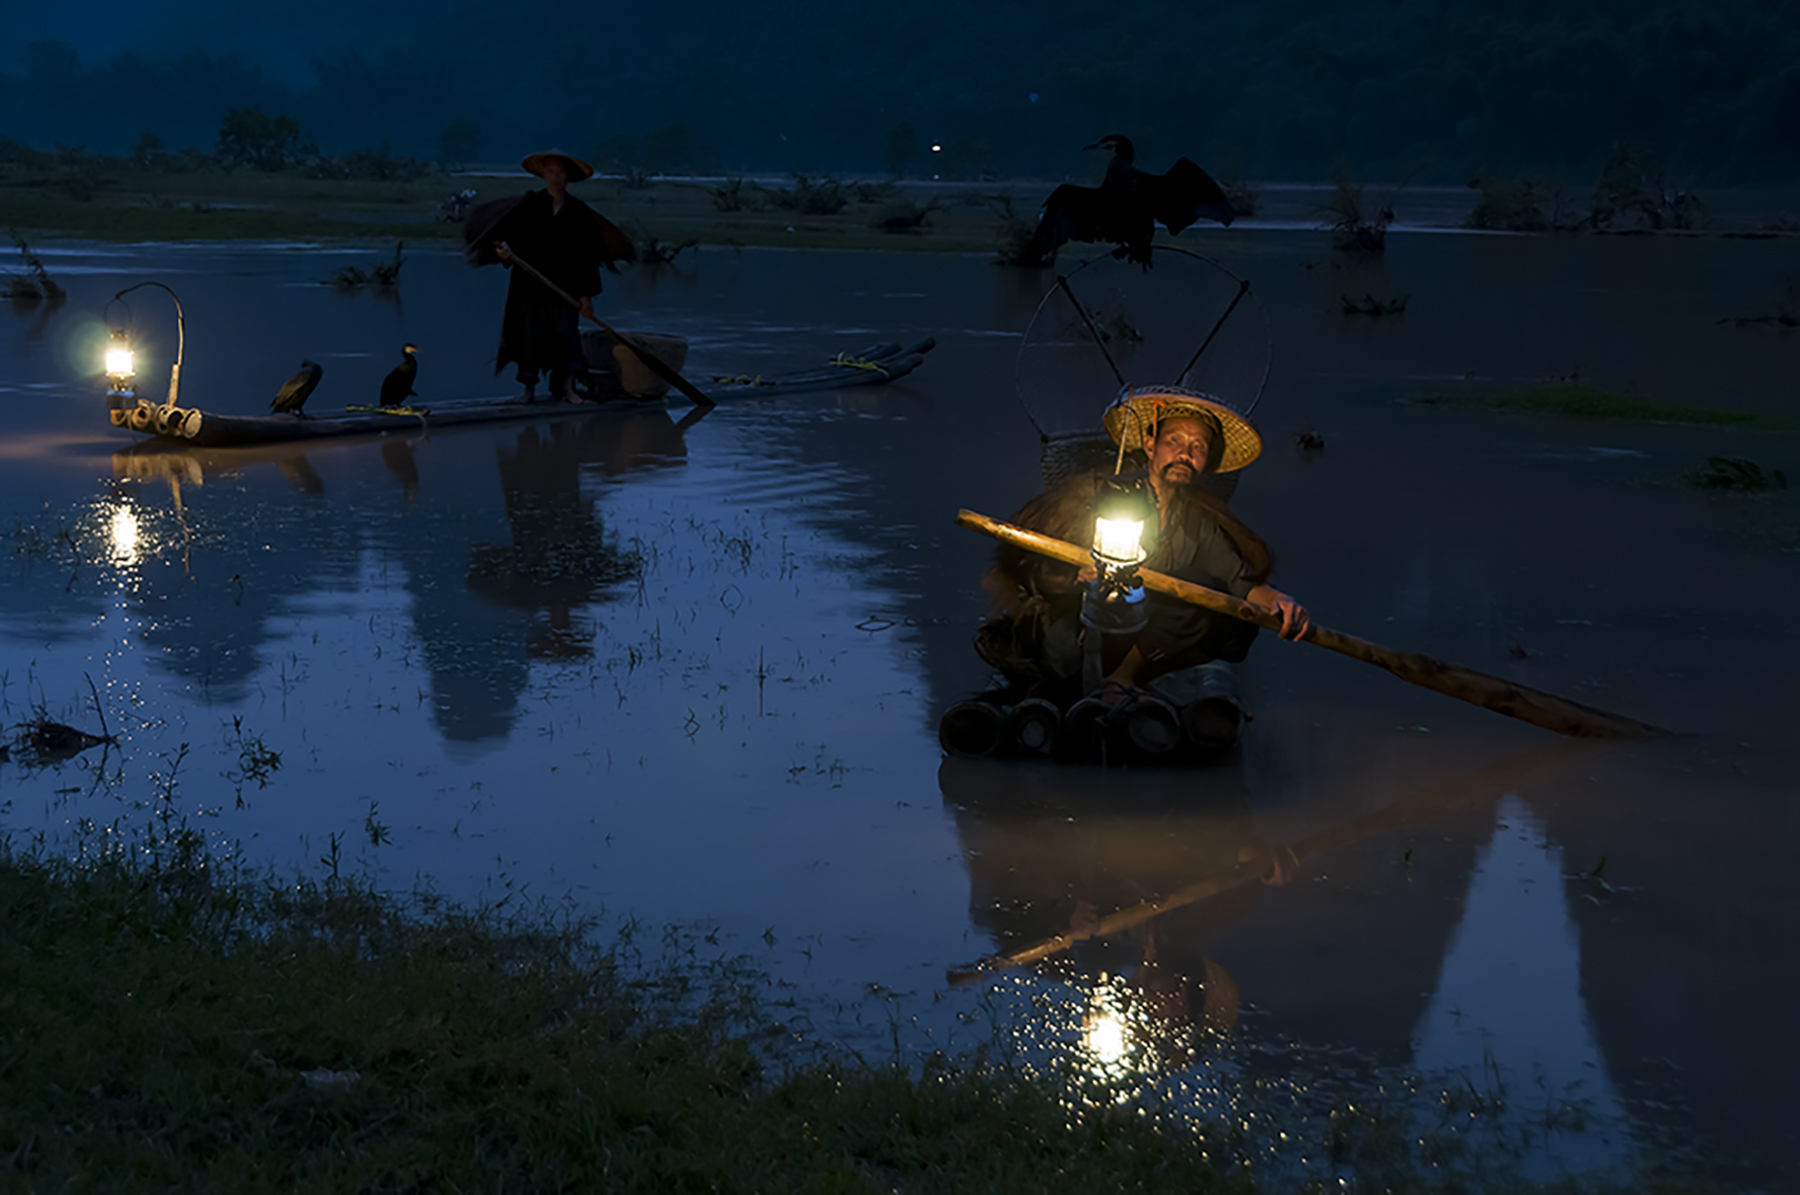 Marlene_Miyamoto_Dying Arts_Cormorant Fisherman 5_5.jpg